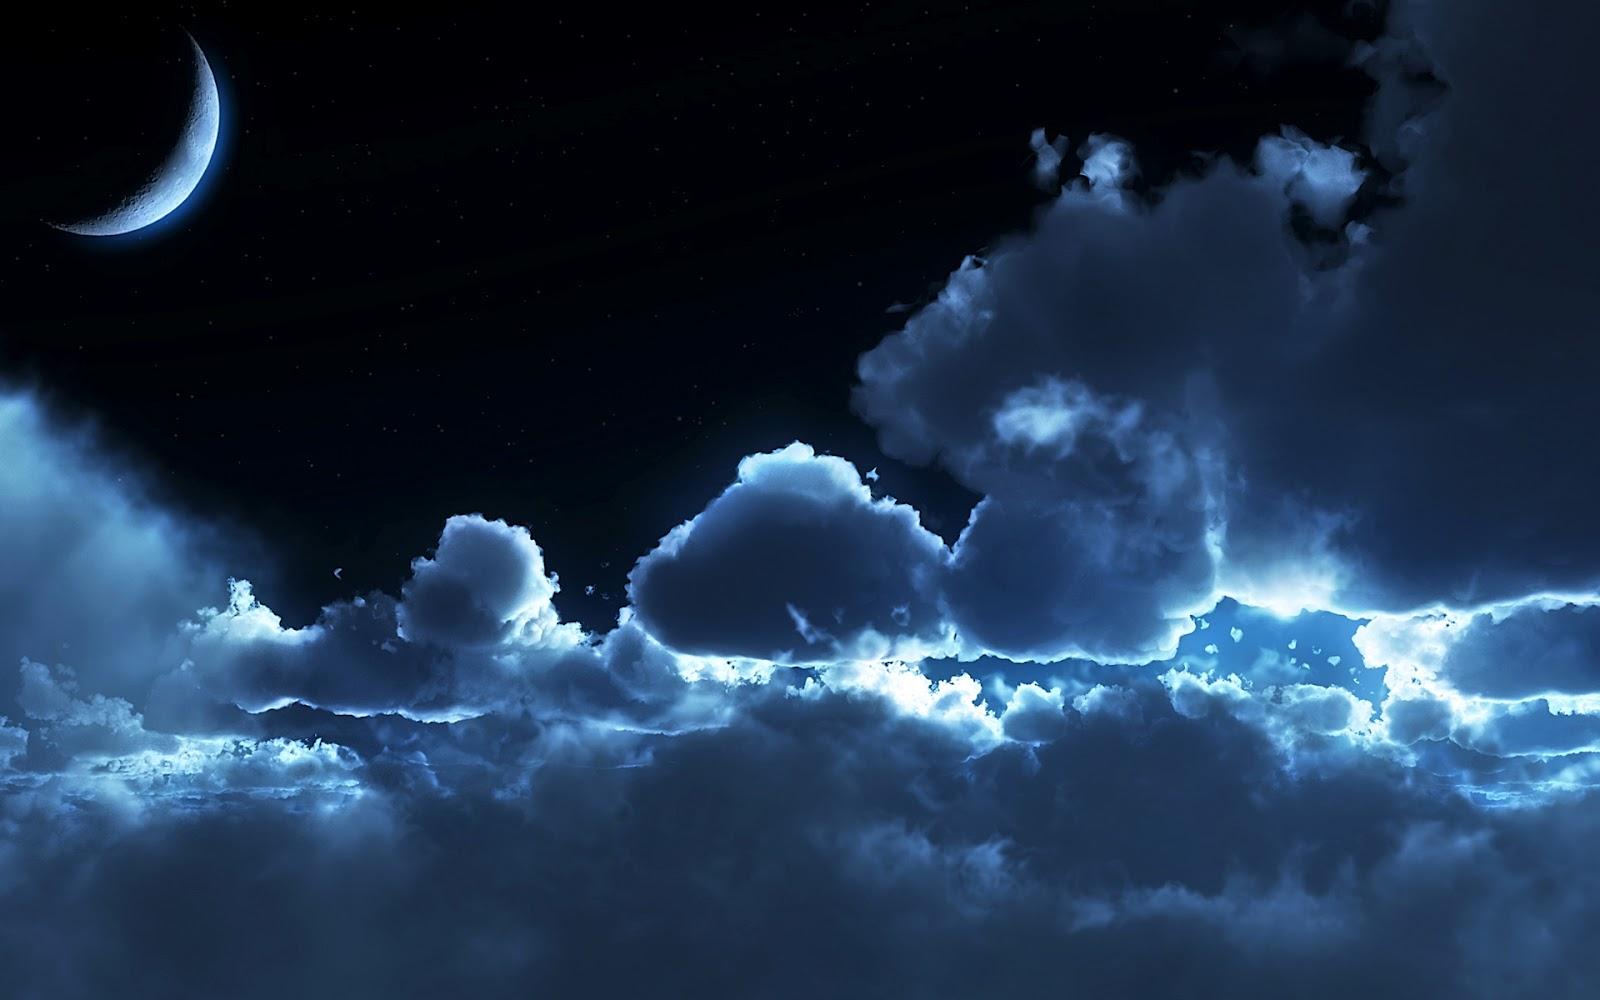 http://2.bp.blogspot.com/-xIaut4YSAA8/UGiUWlJImeI/AAAAAAAABoQ/NZdYrHet_wo/s1600/wallpaper-cloud-moon.jpg